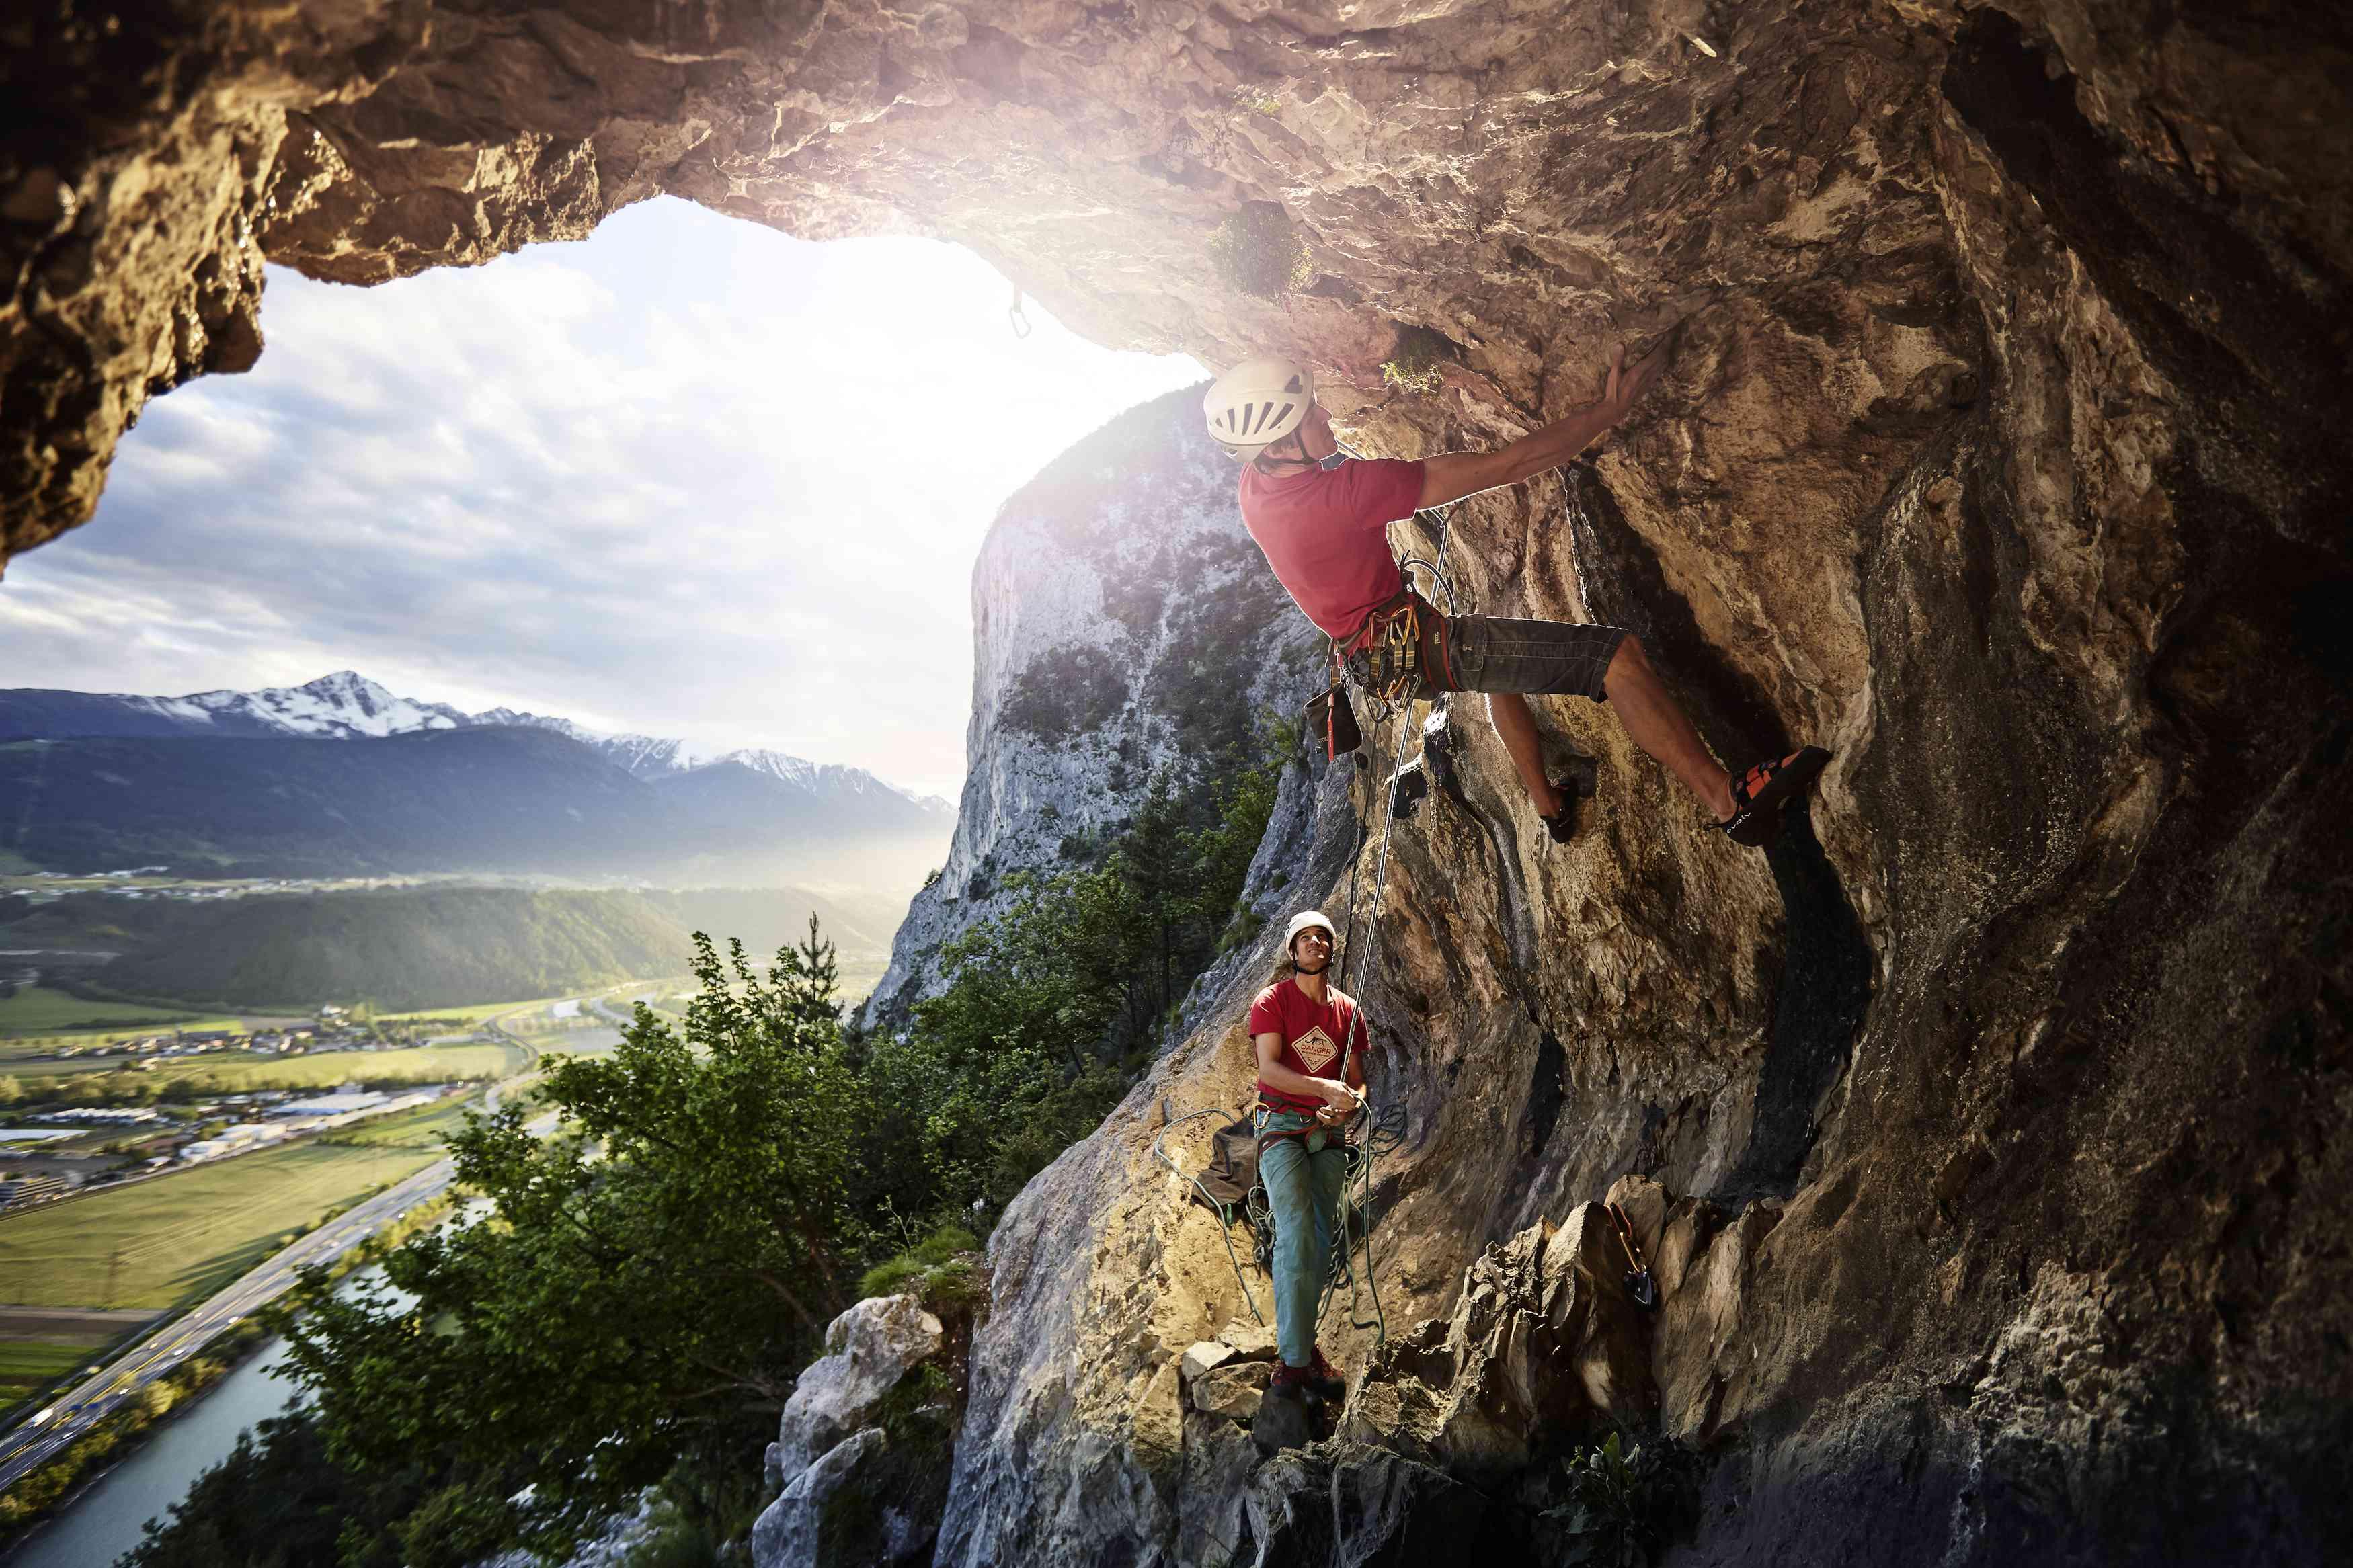 Rock climber on a curved wall in Innsbruck, Austria